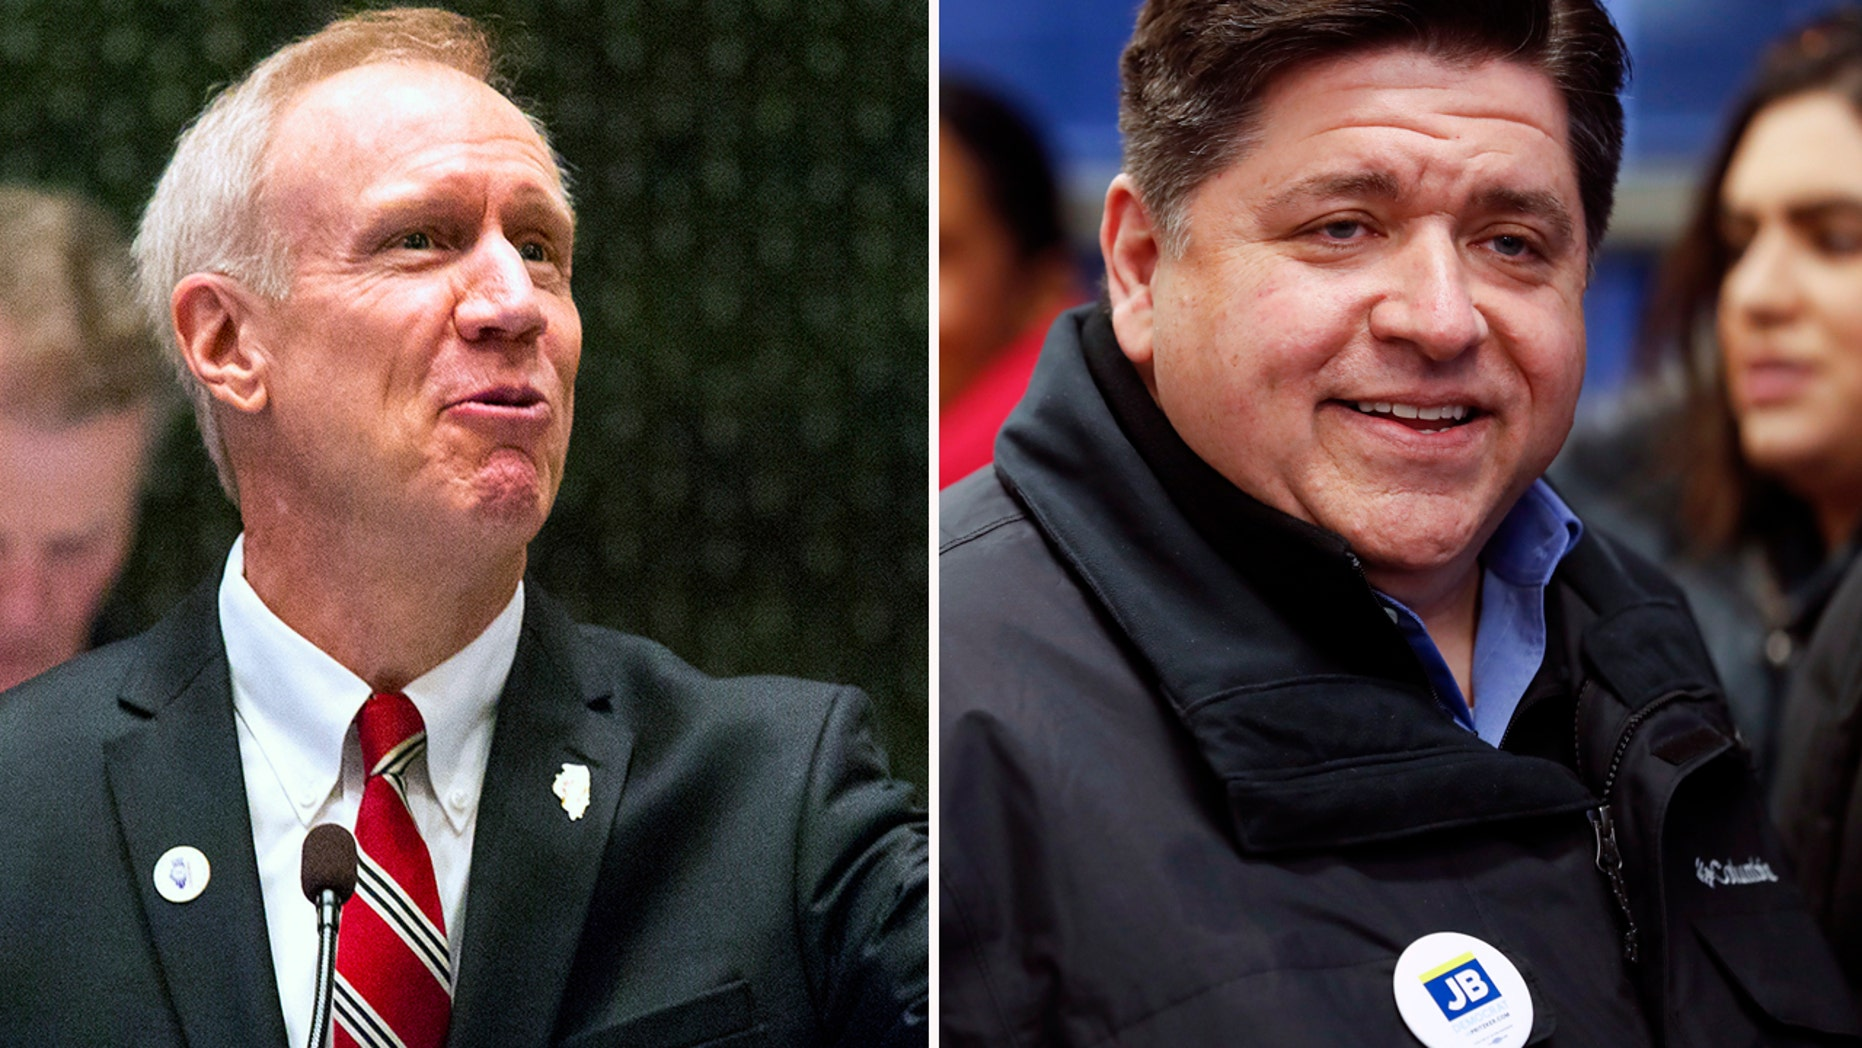 Illinois Gov. Bruce Rauner, left, and Democratic gubernatorial candidate J.B. Pritzker.